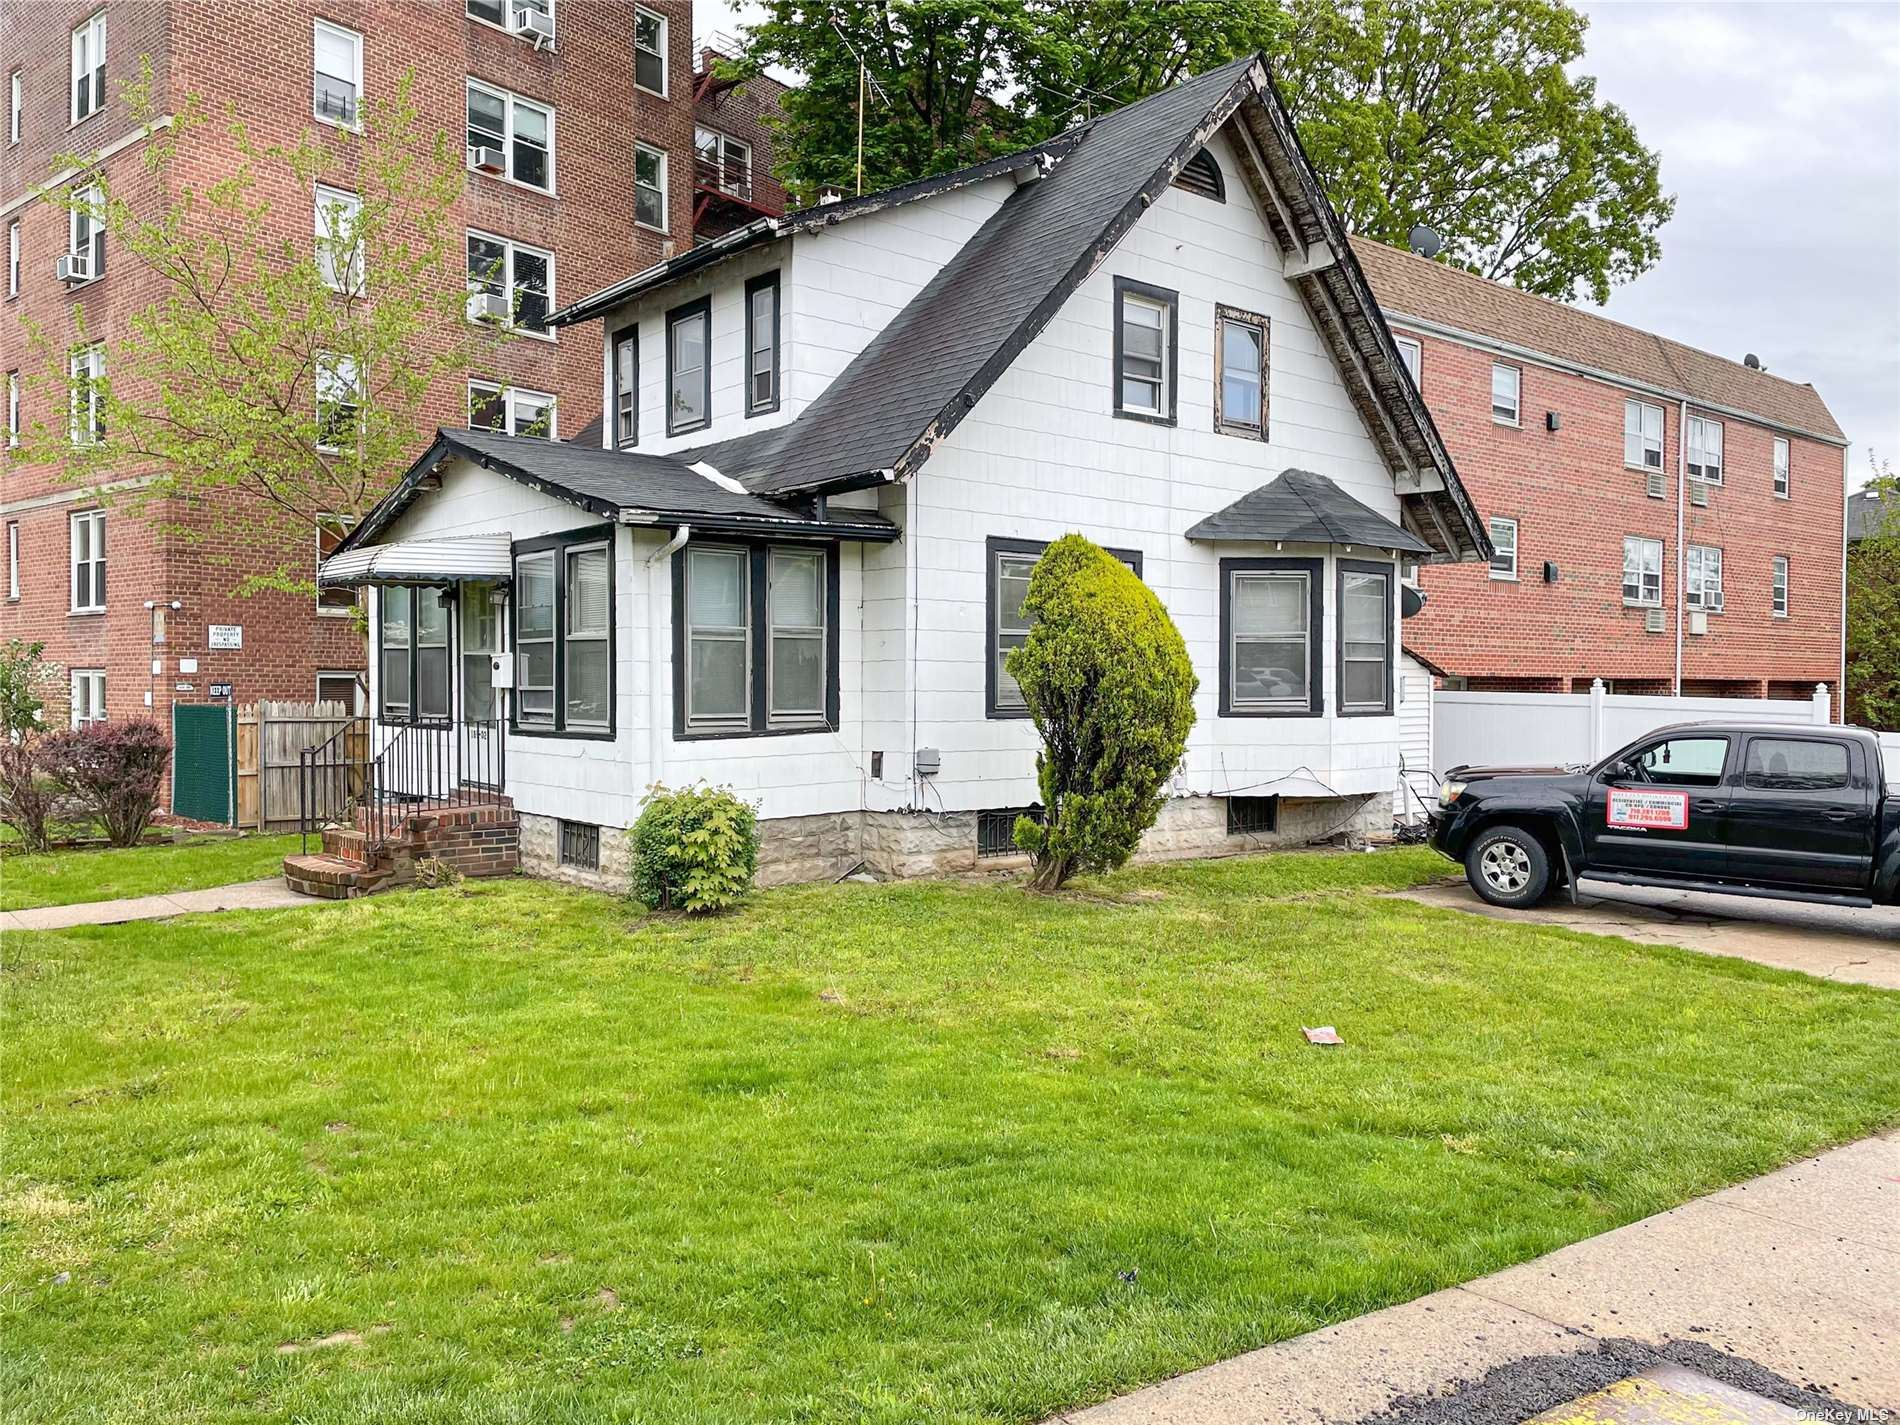 189-02 Crocheron Avenue, Flushing, NY 11358 - MLS#: 3309855